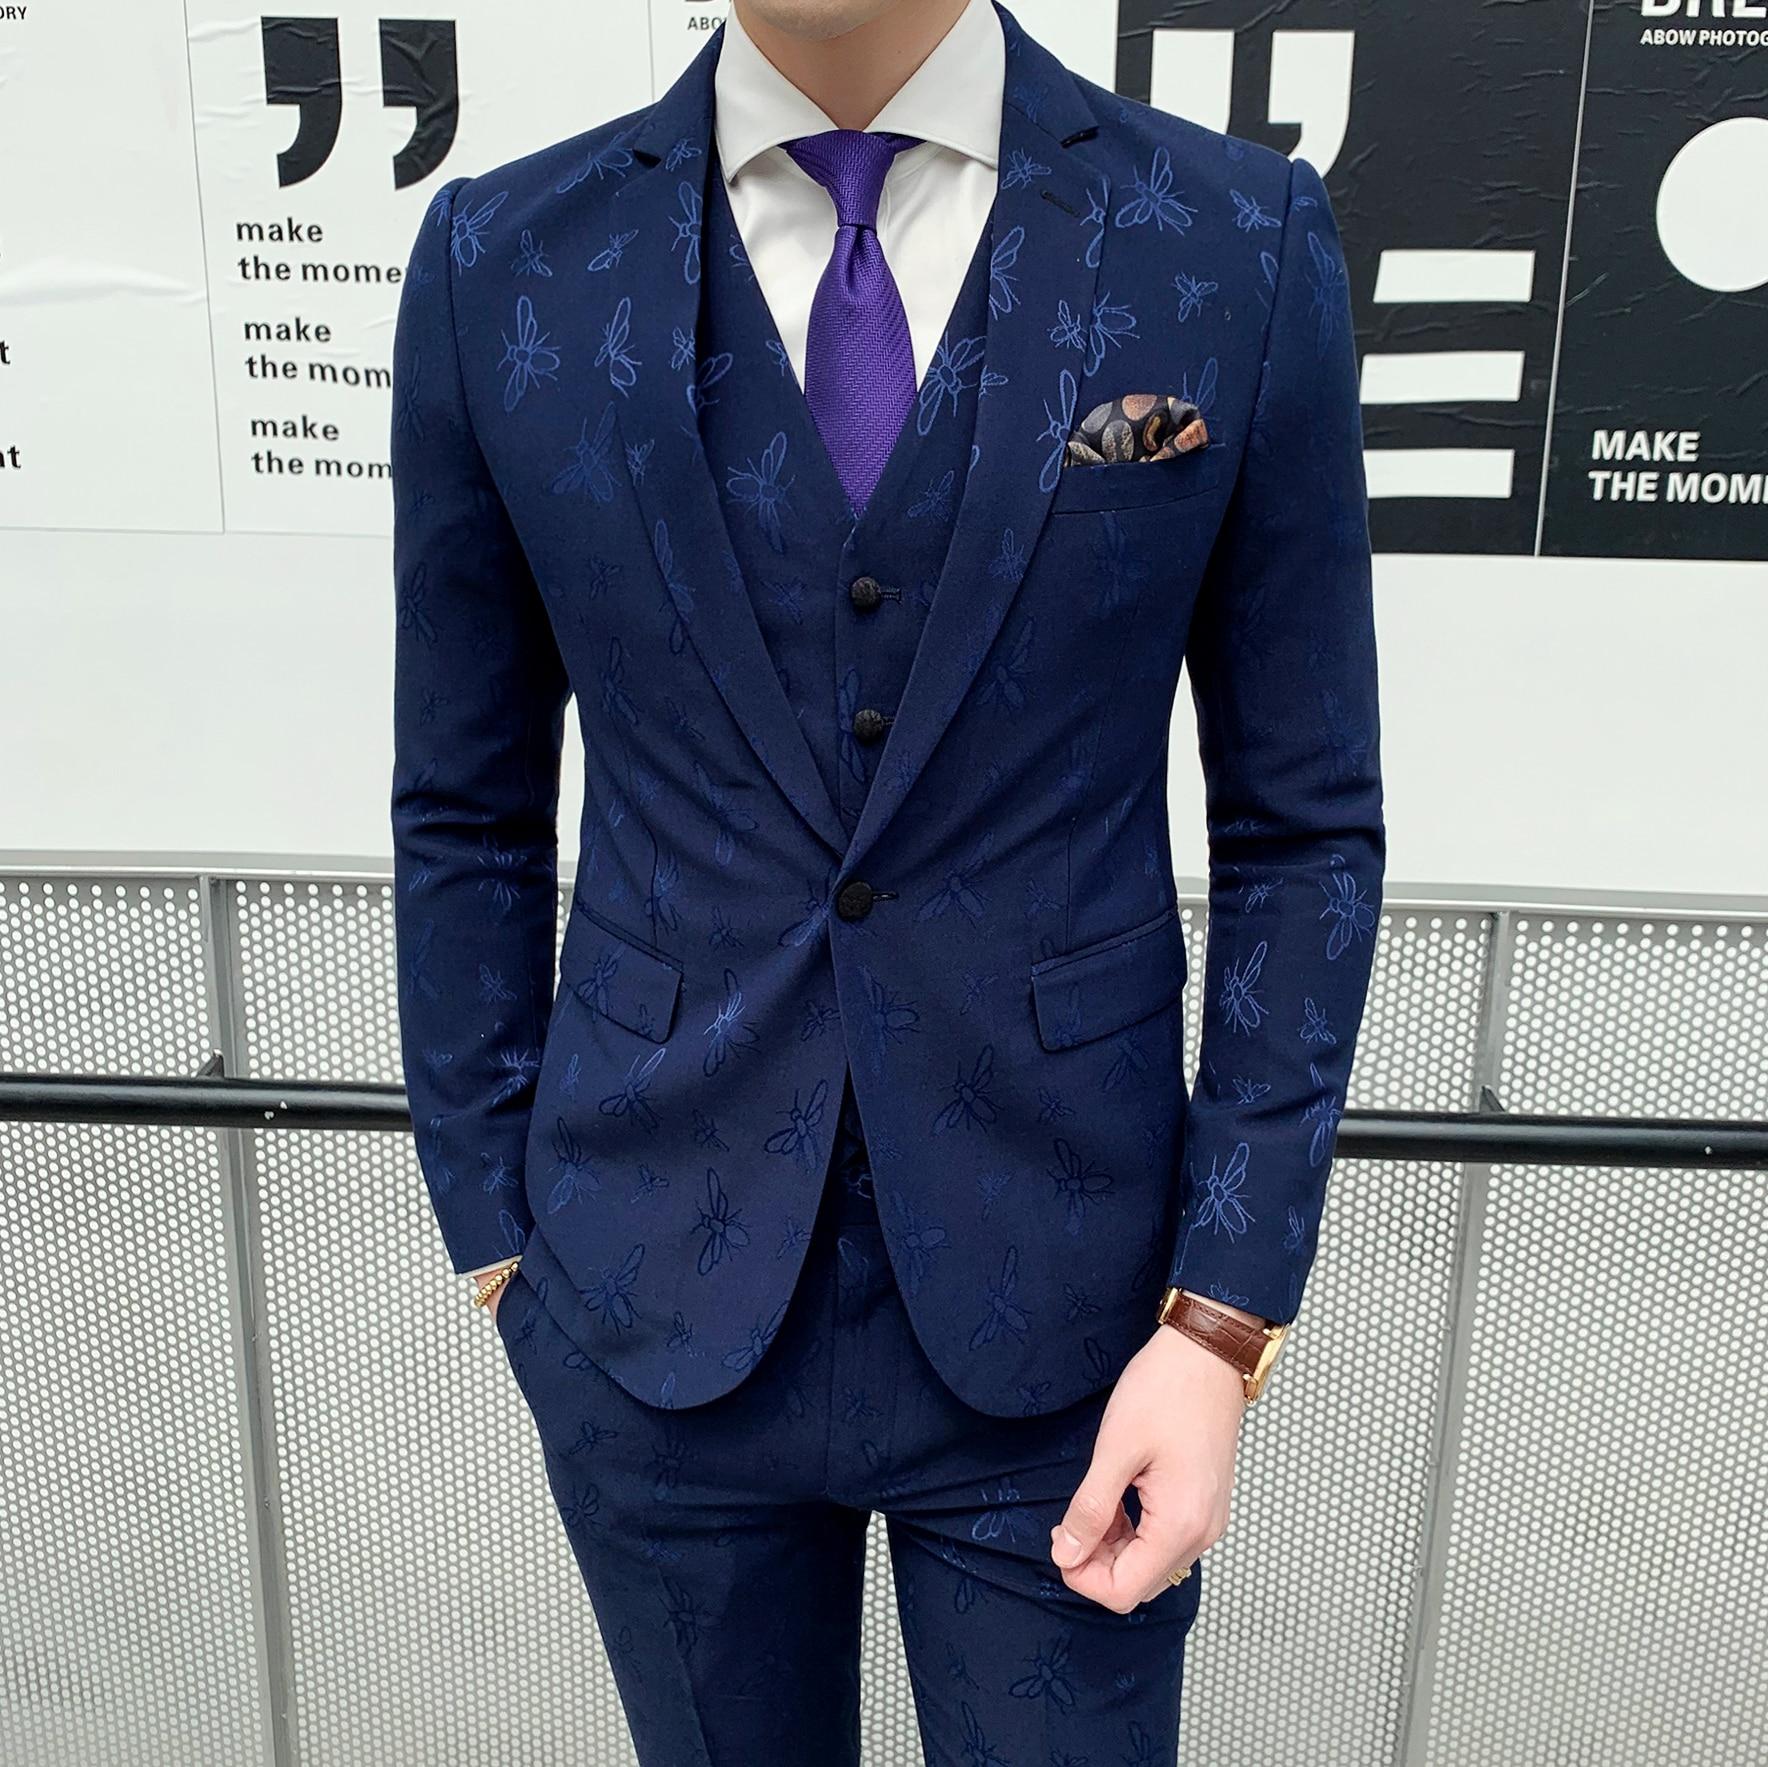 Mens Suits Designers 2019 Bee Embroidery Costume Homme 3 Piece Formal Dinner Dress Gentleman Elegant Suit Blue Vestito Uomo